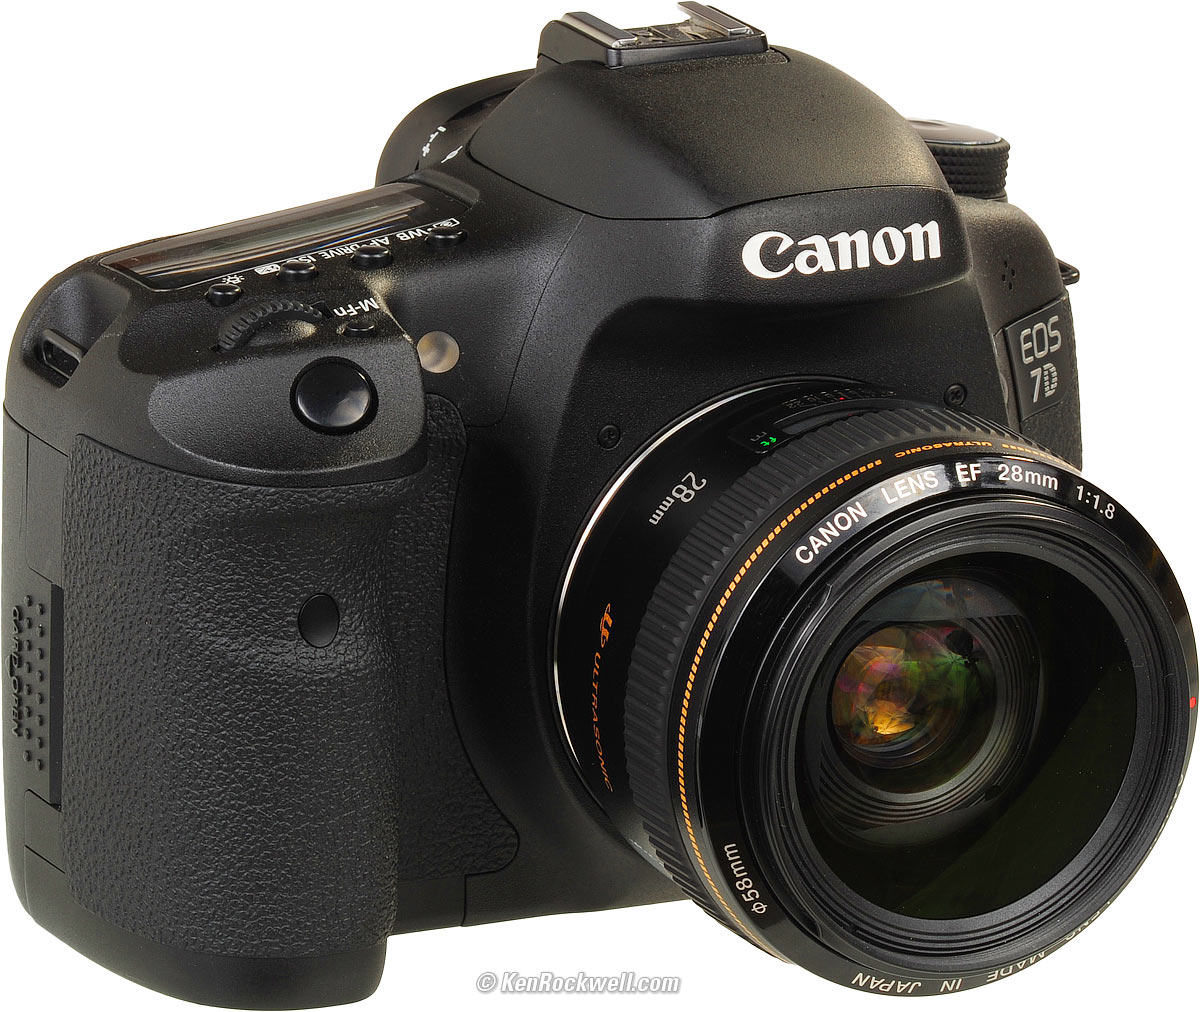 Angkringanmalam Harga Canon 7D Baru Dan Bekas